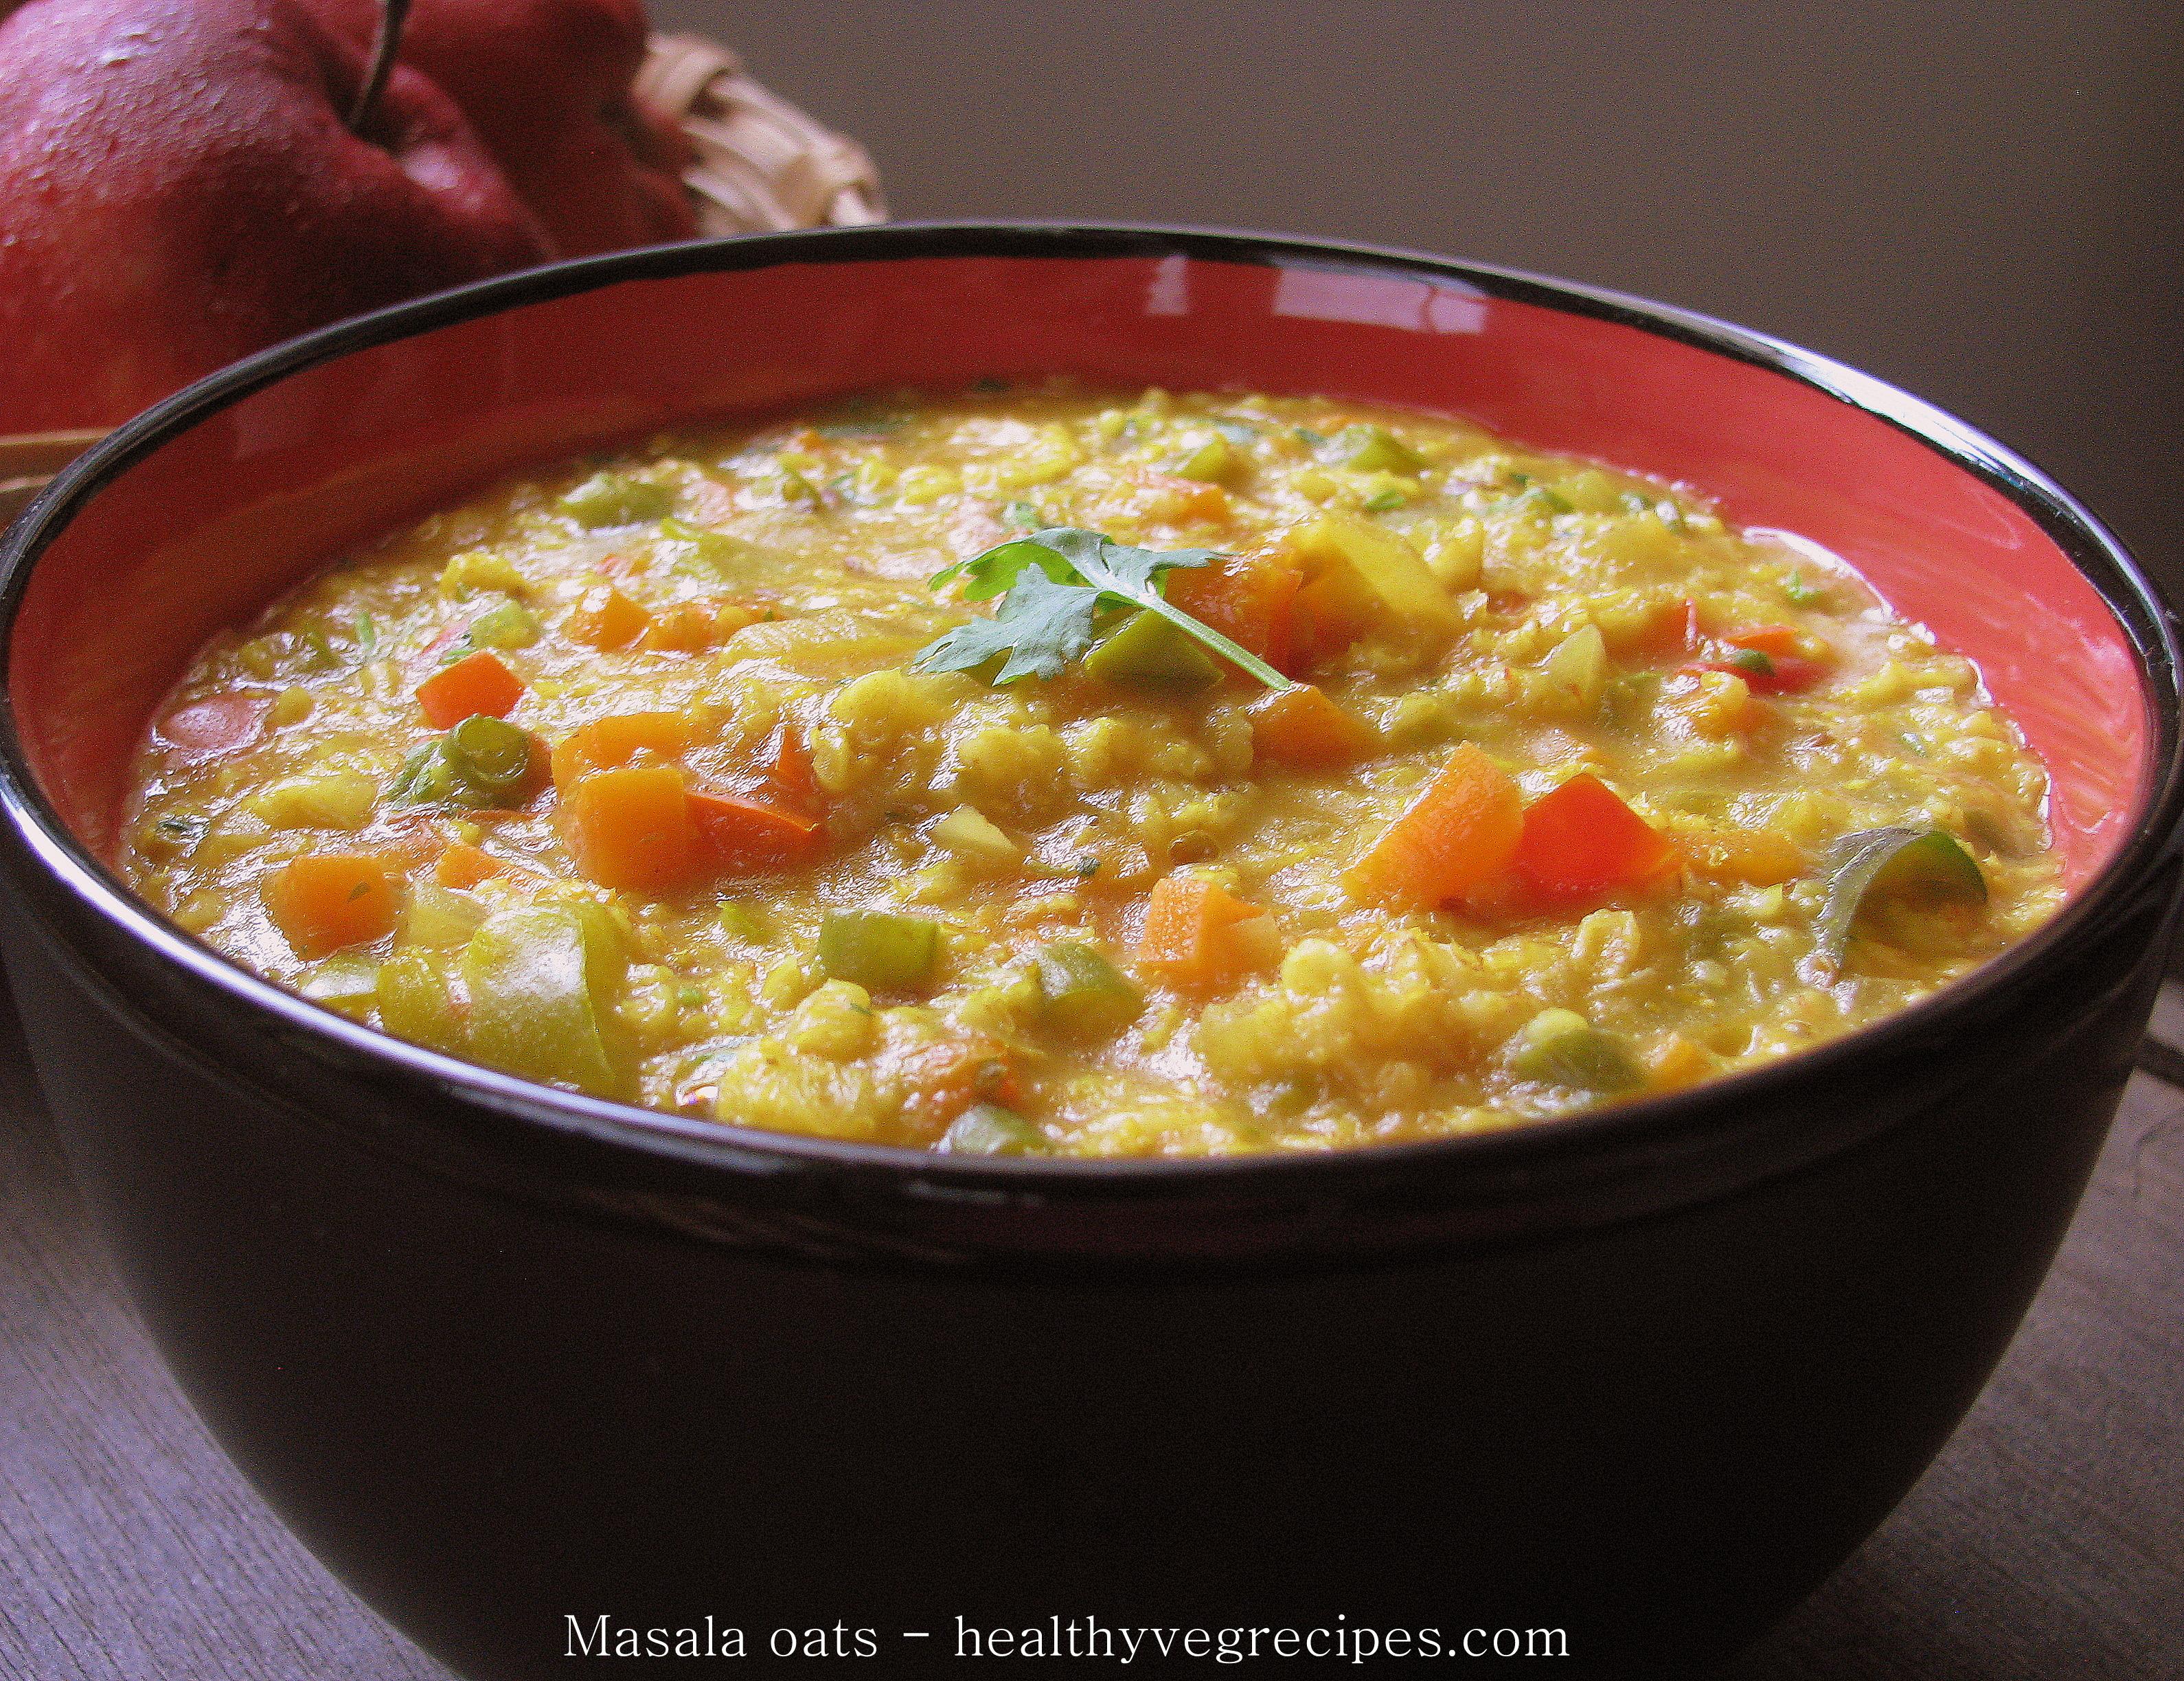 Masala oats | How to make masala oats at home | Healthy ...